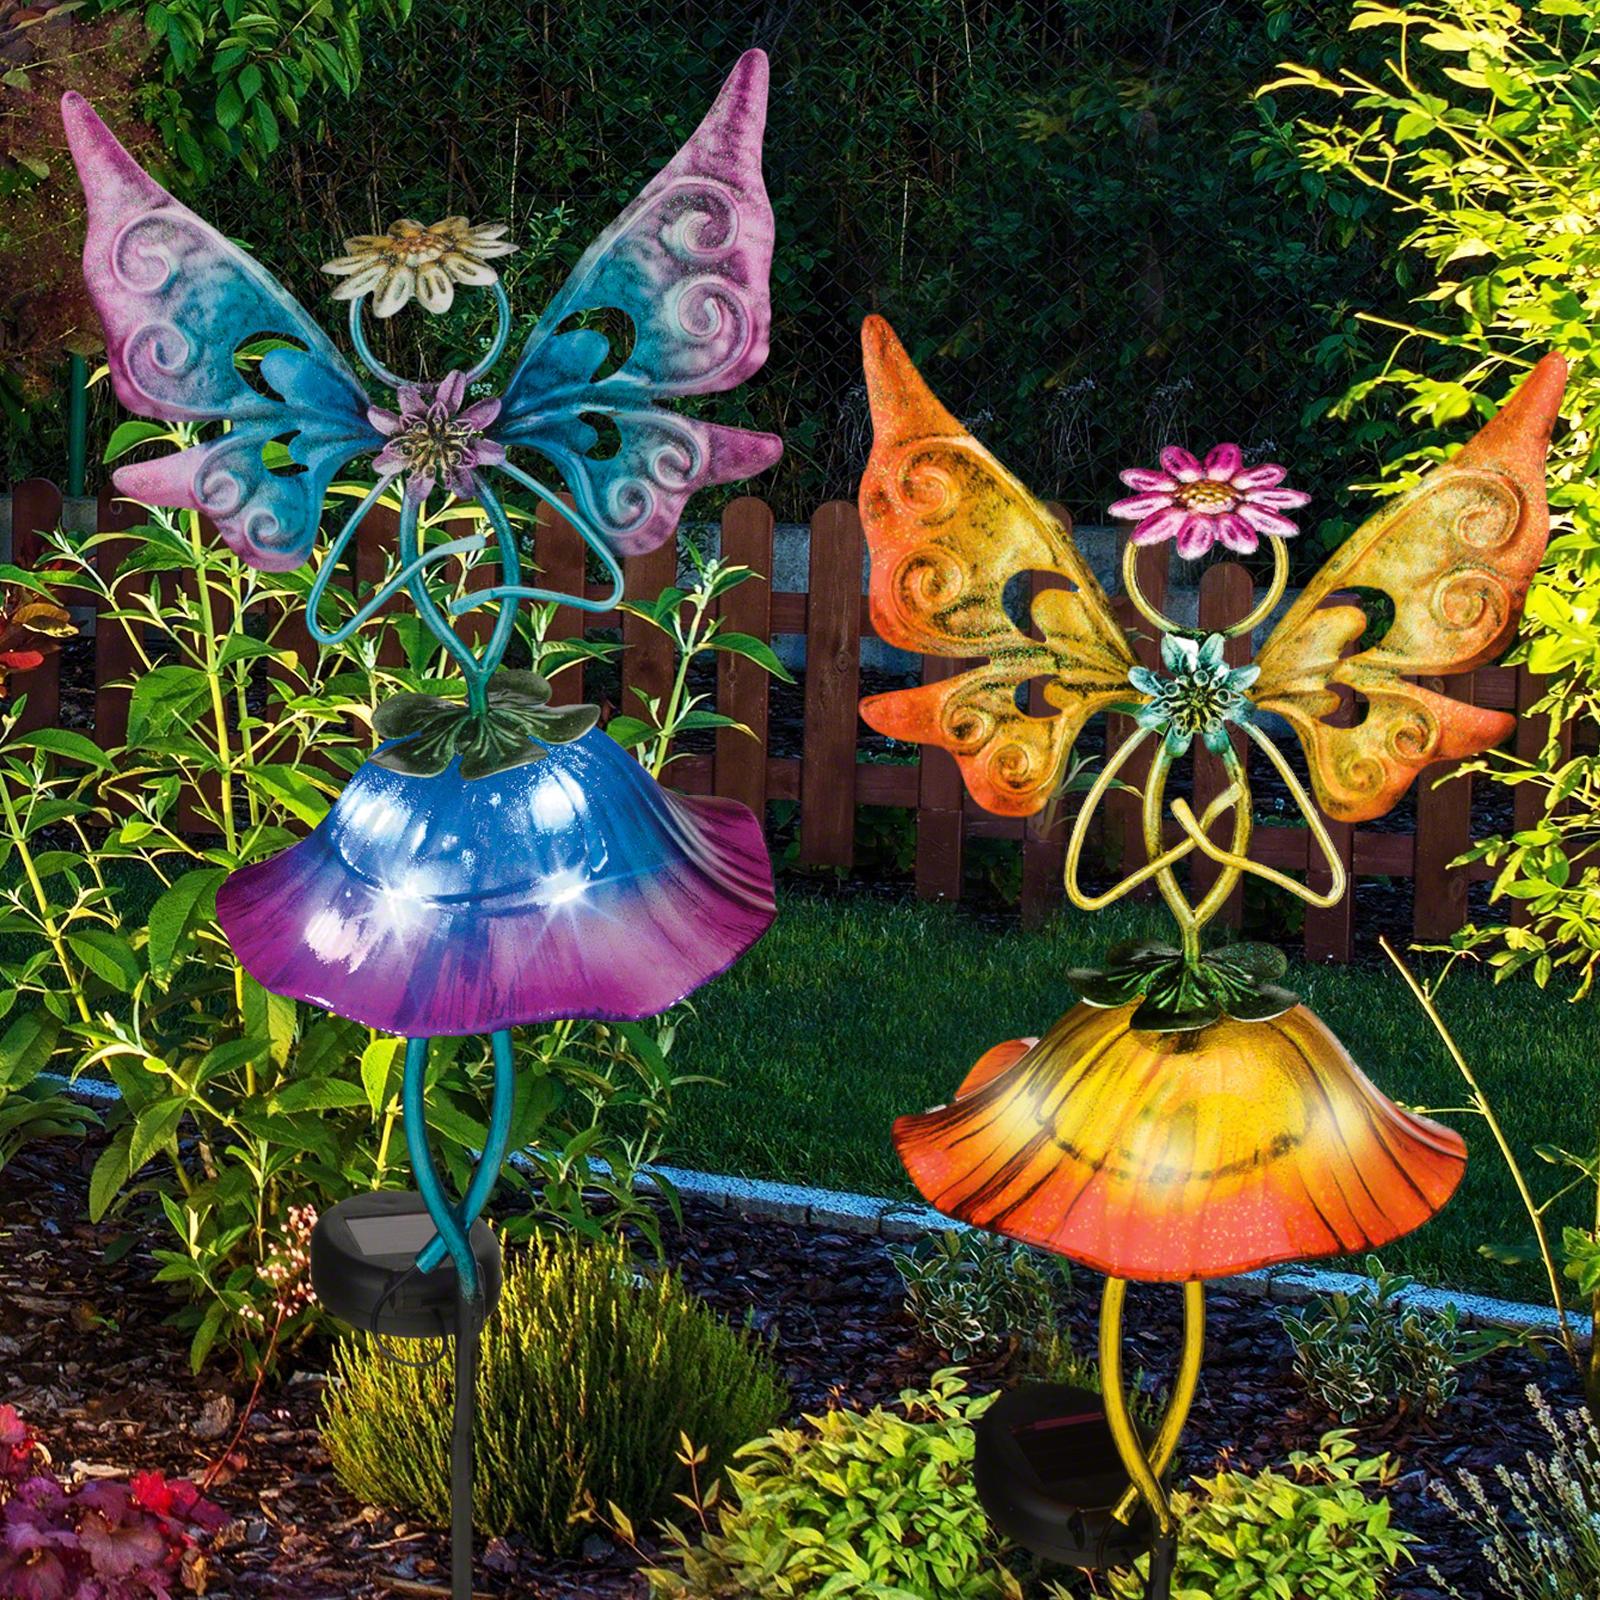 buy cheap solar powered garden lights compare lighting. Black Bedroom Furniture Sets. Home Design Ideas